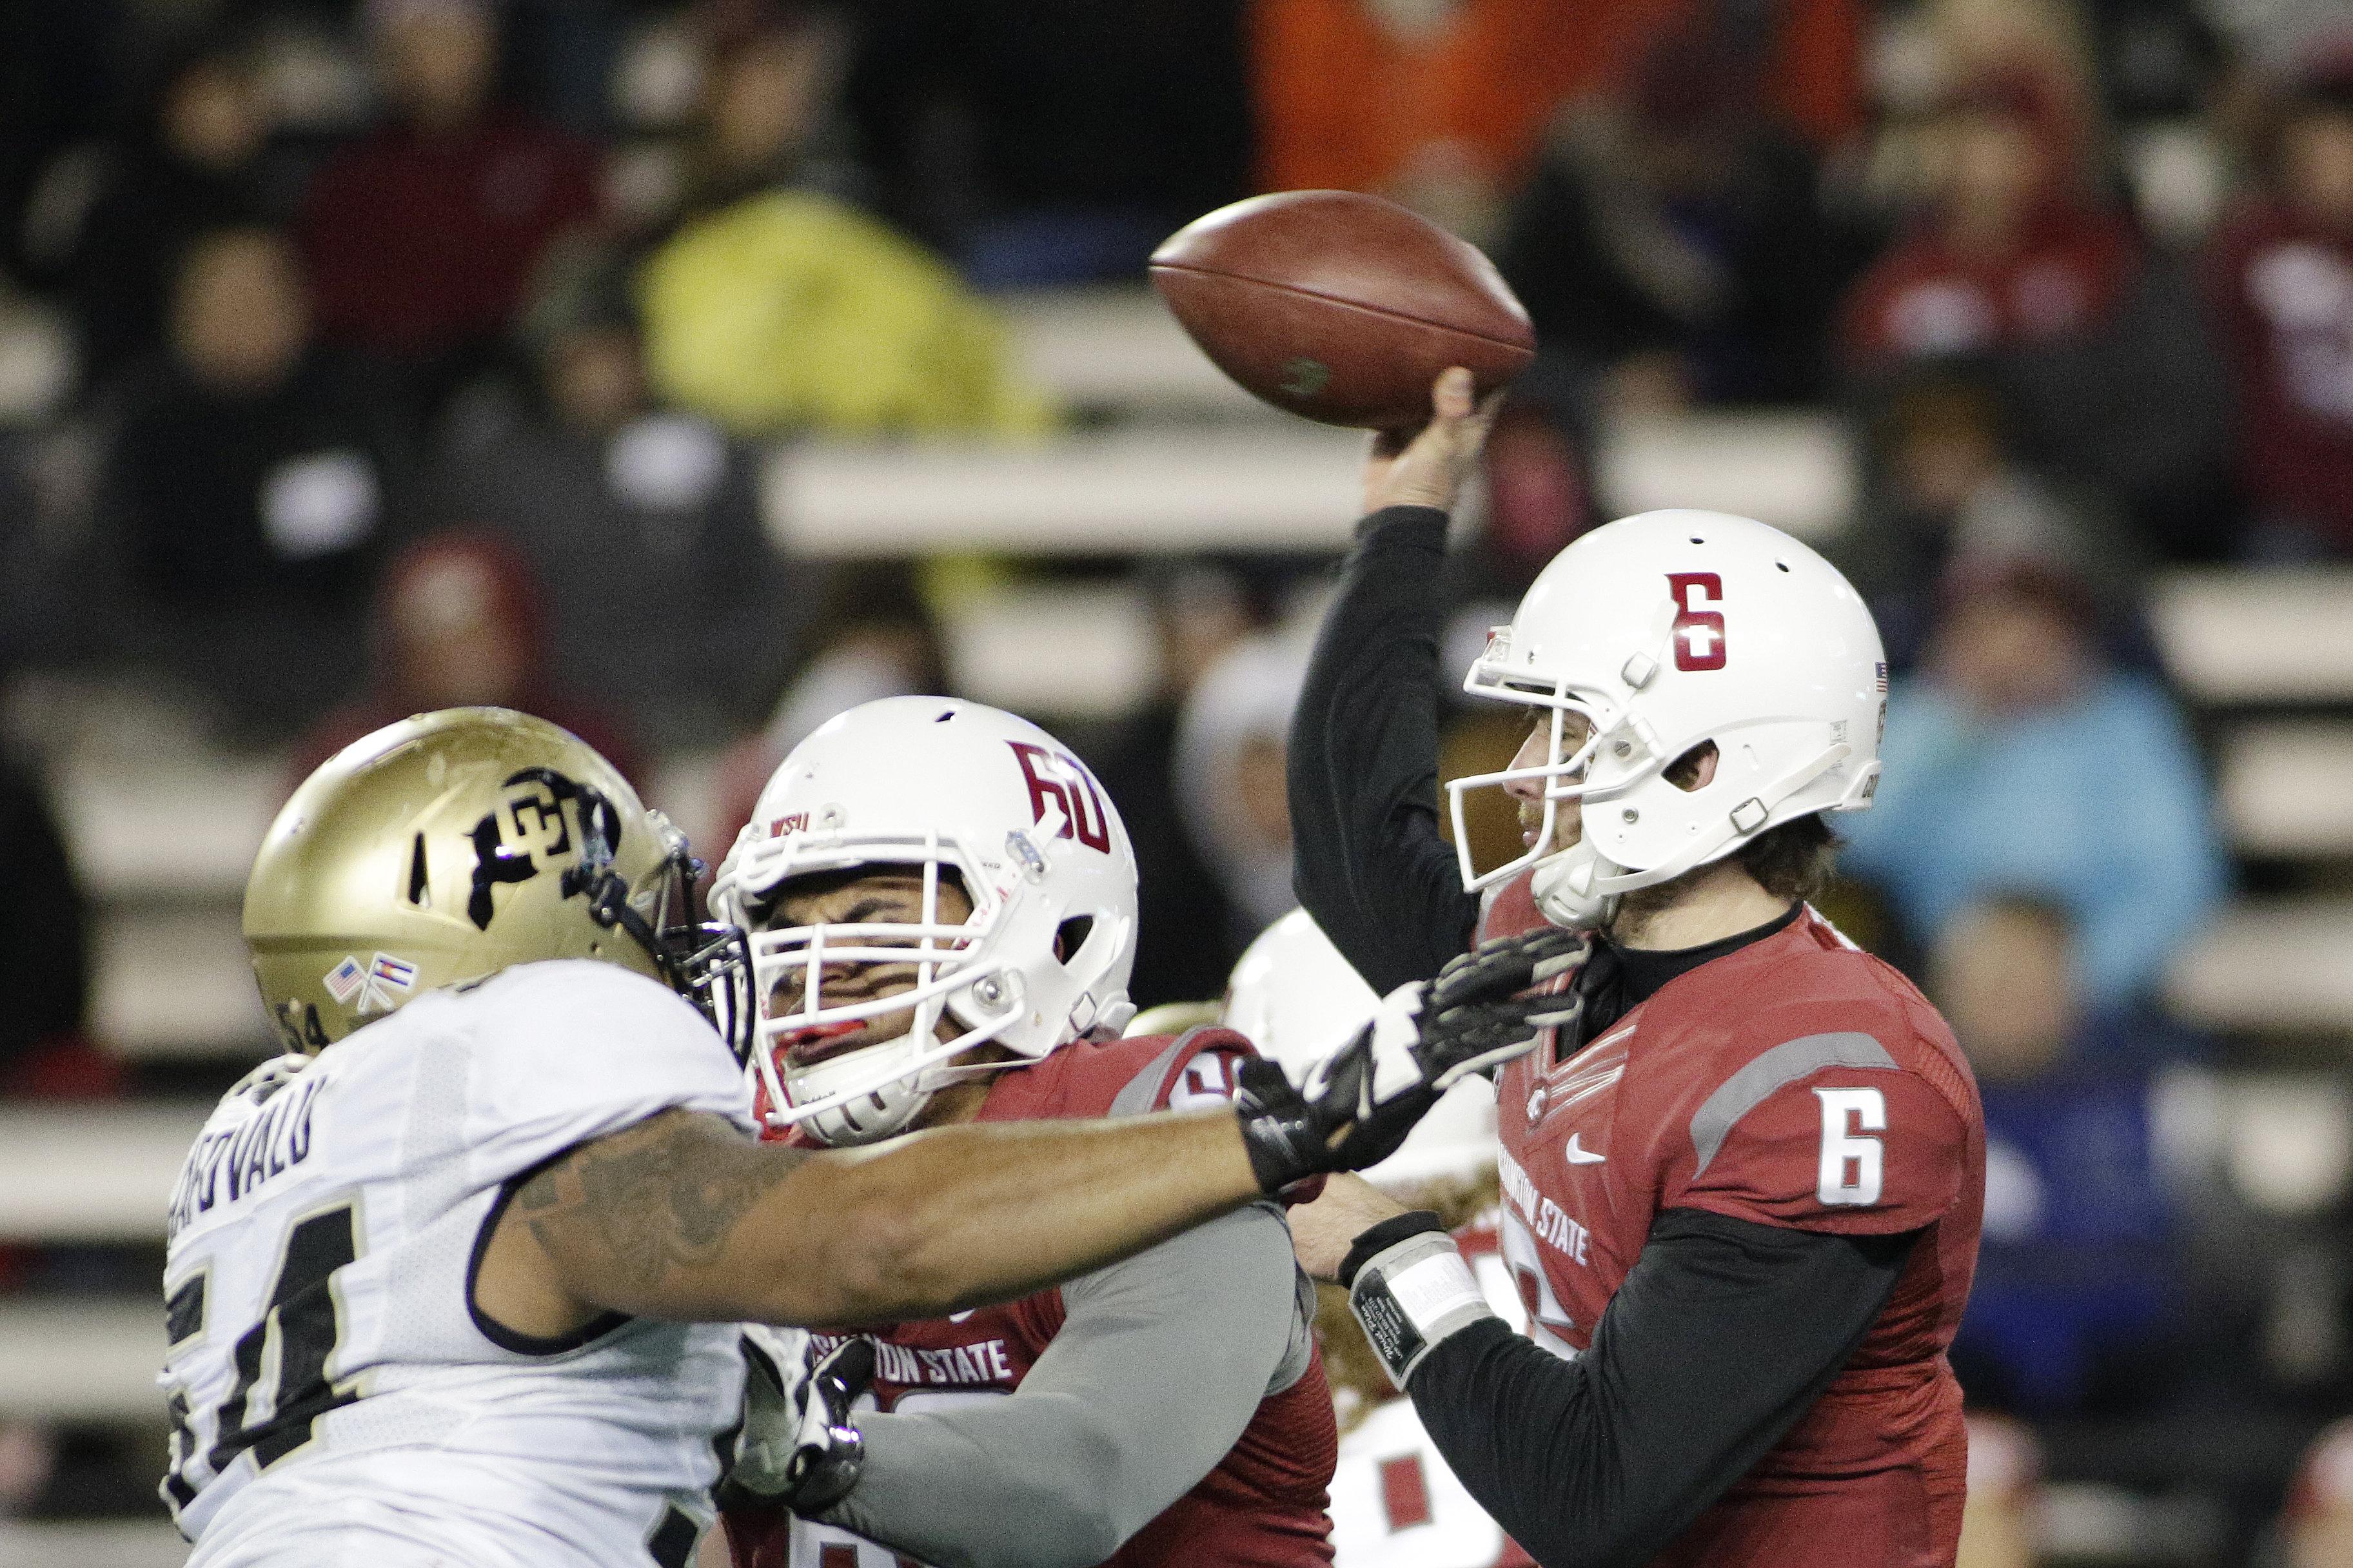 Washington State quarterback Peyton Bender (6) throws a pass during the second half of an NCAA college football game against Colorado, Saturday, Nov. 21, 2015, in Pullman, Wash. Washington State won 27-3. (AP Photo/Young Kwak)